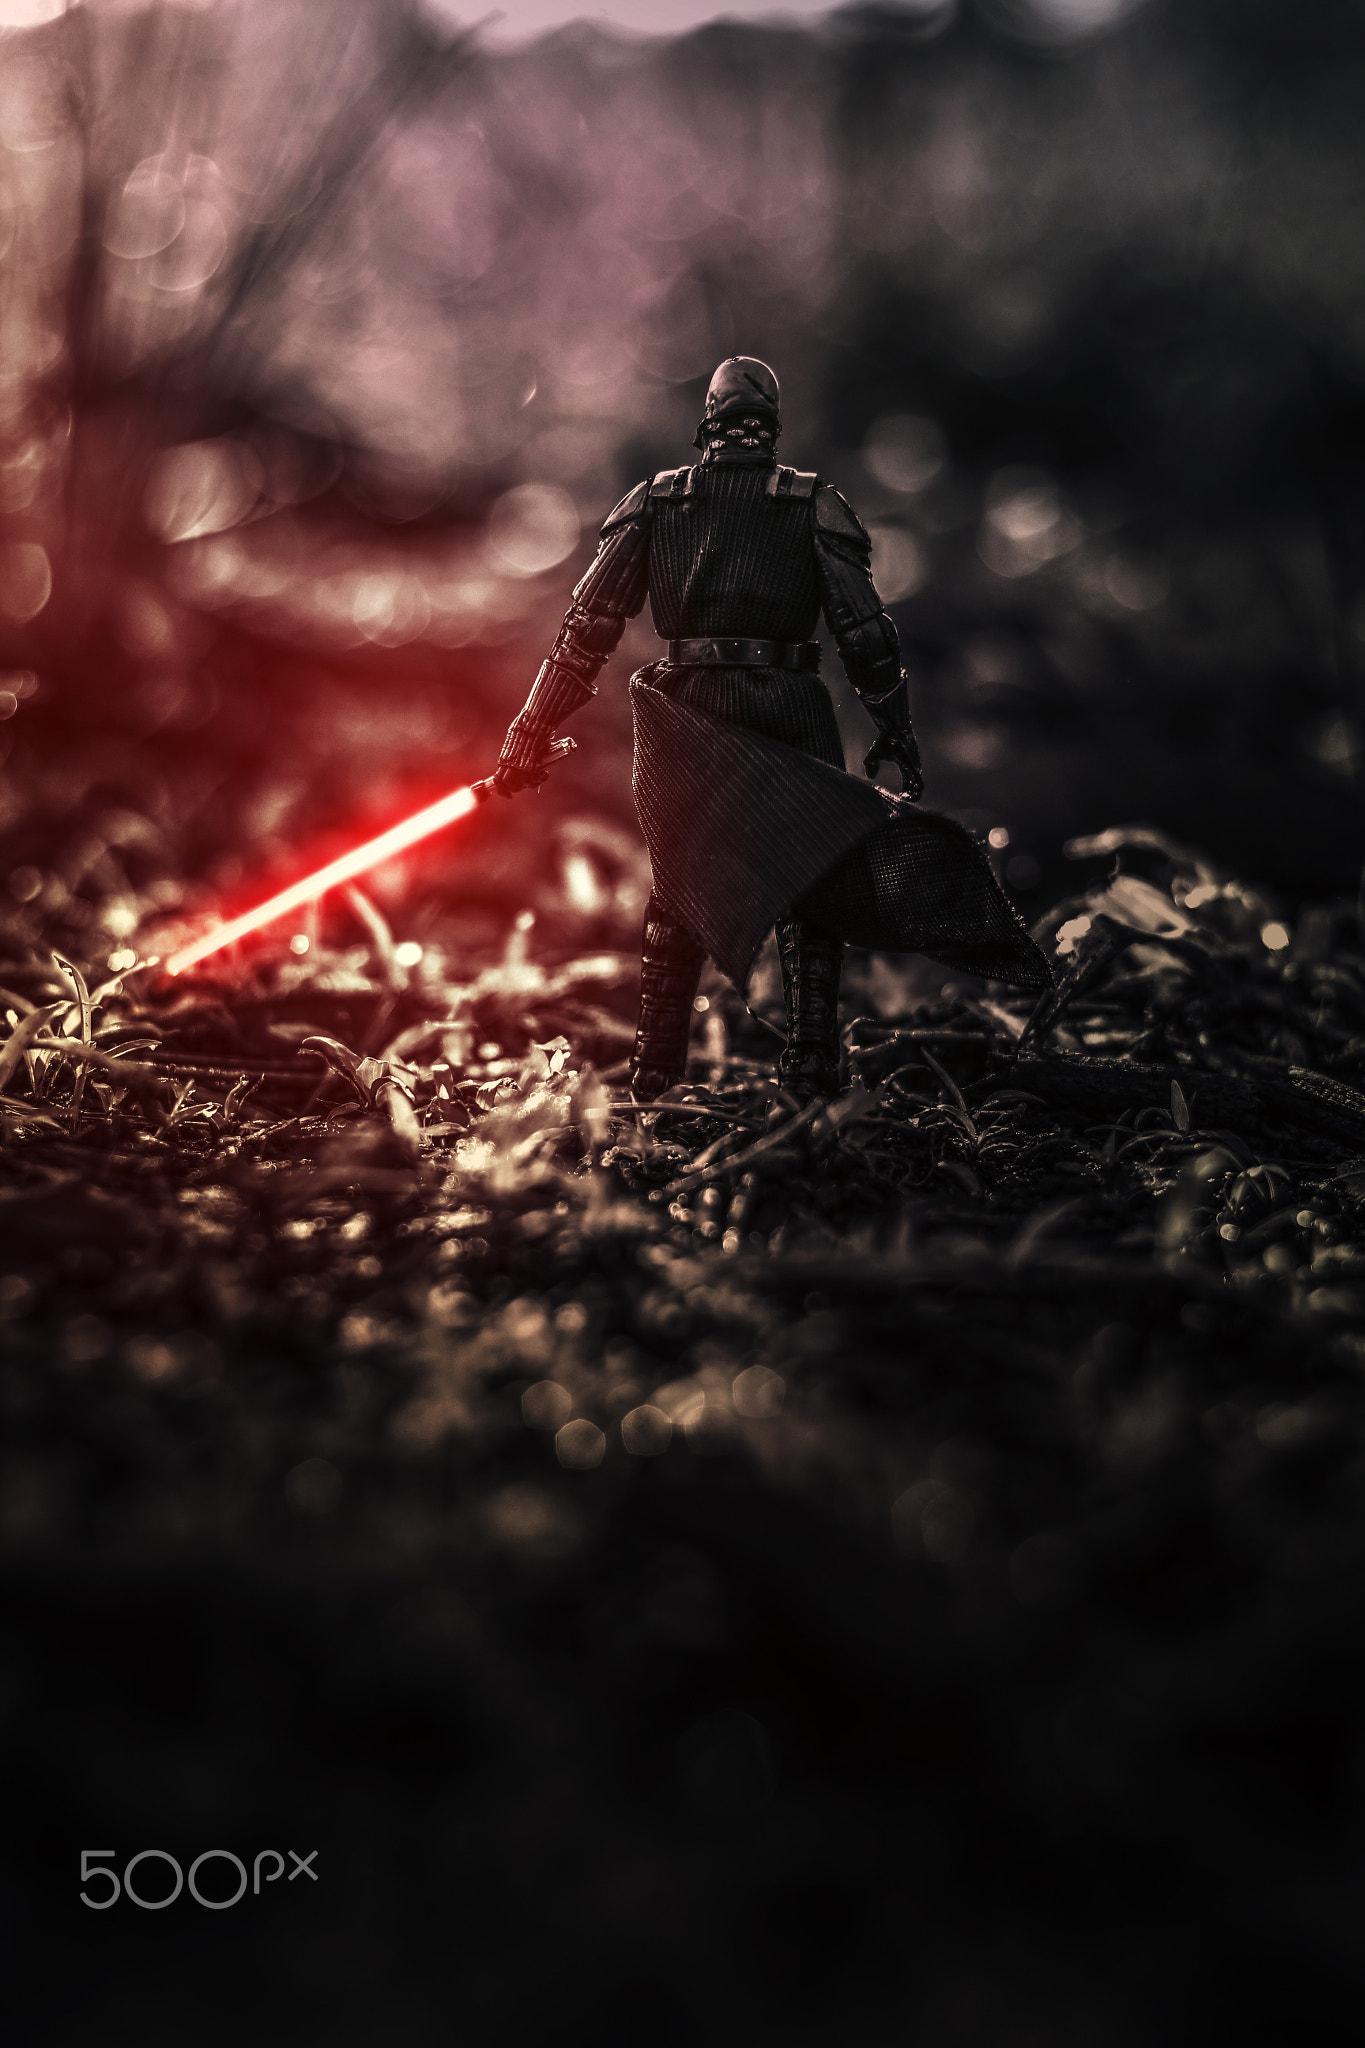 Wallpaper Toys 500px Zahir Batin Darth Vader Anakin